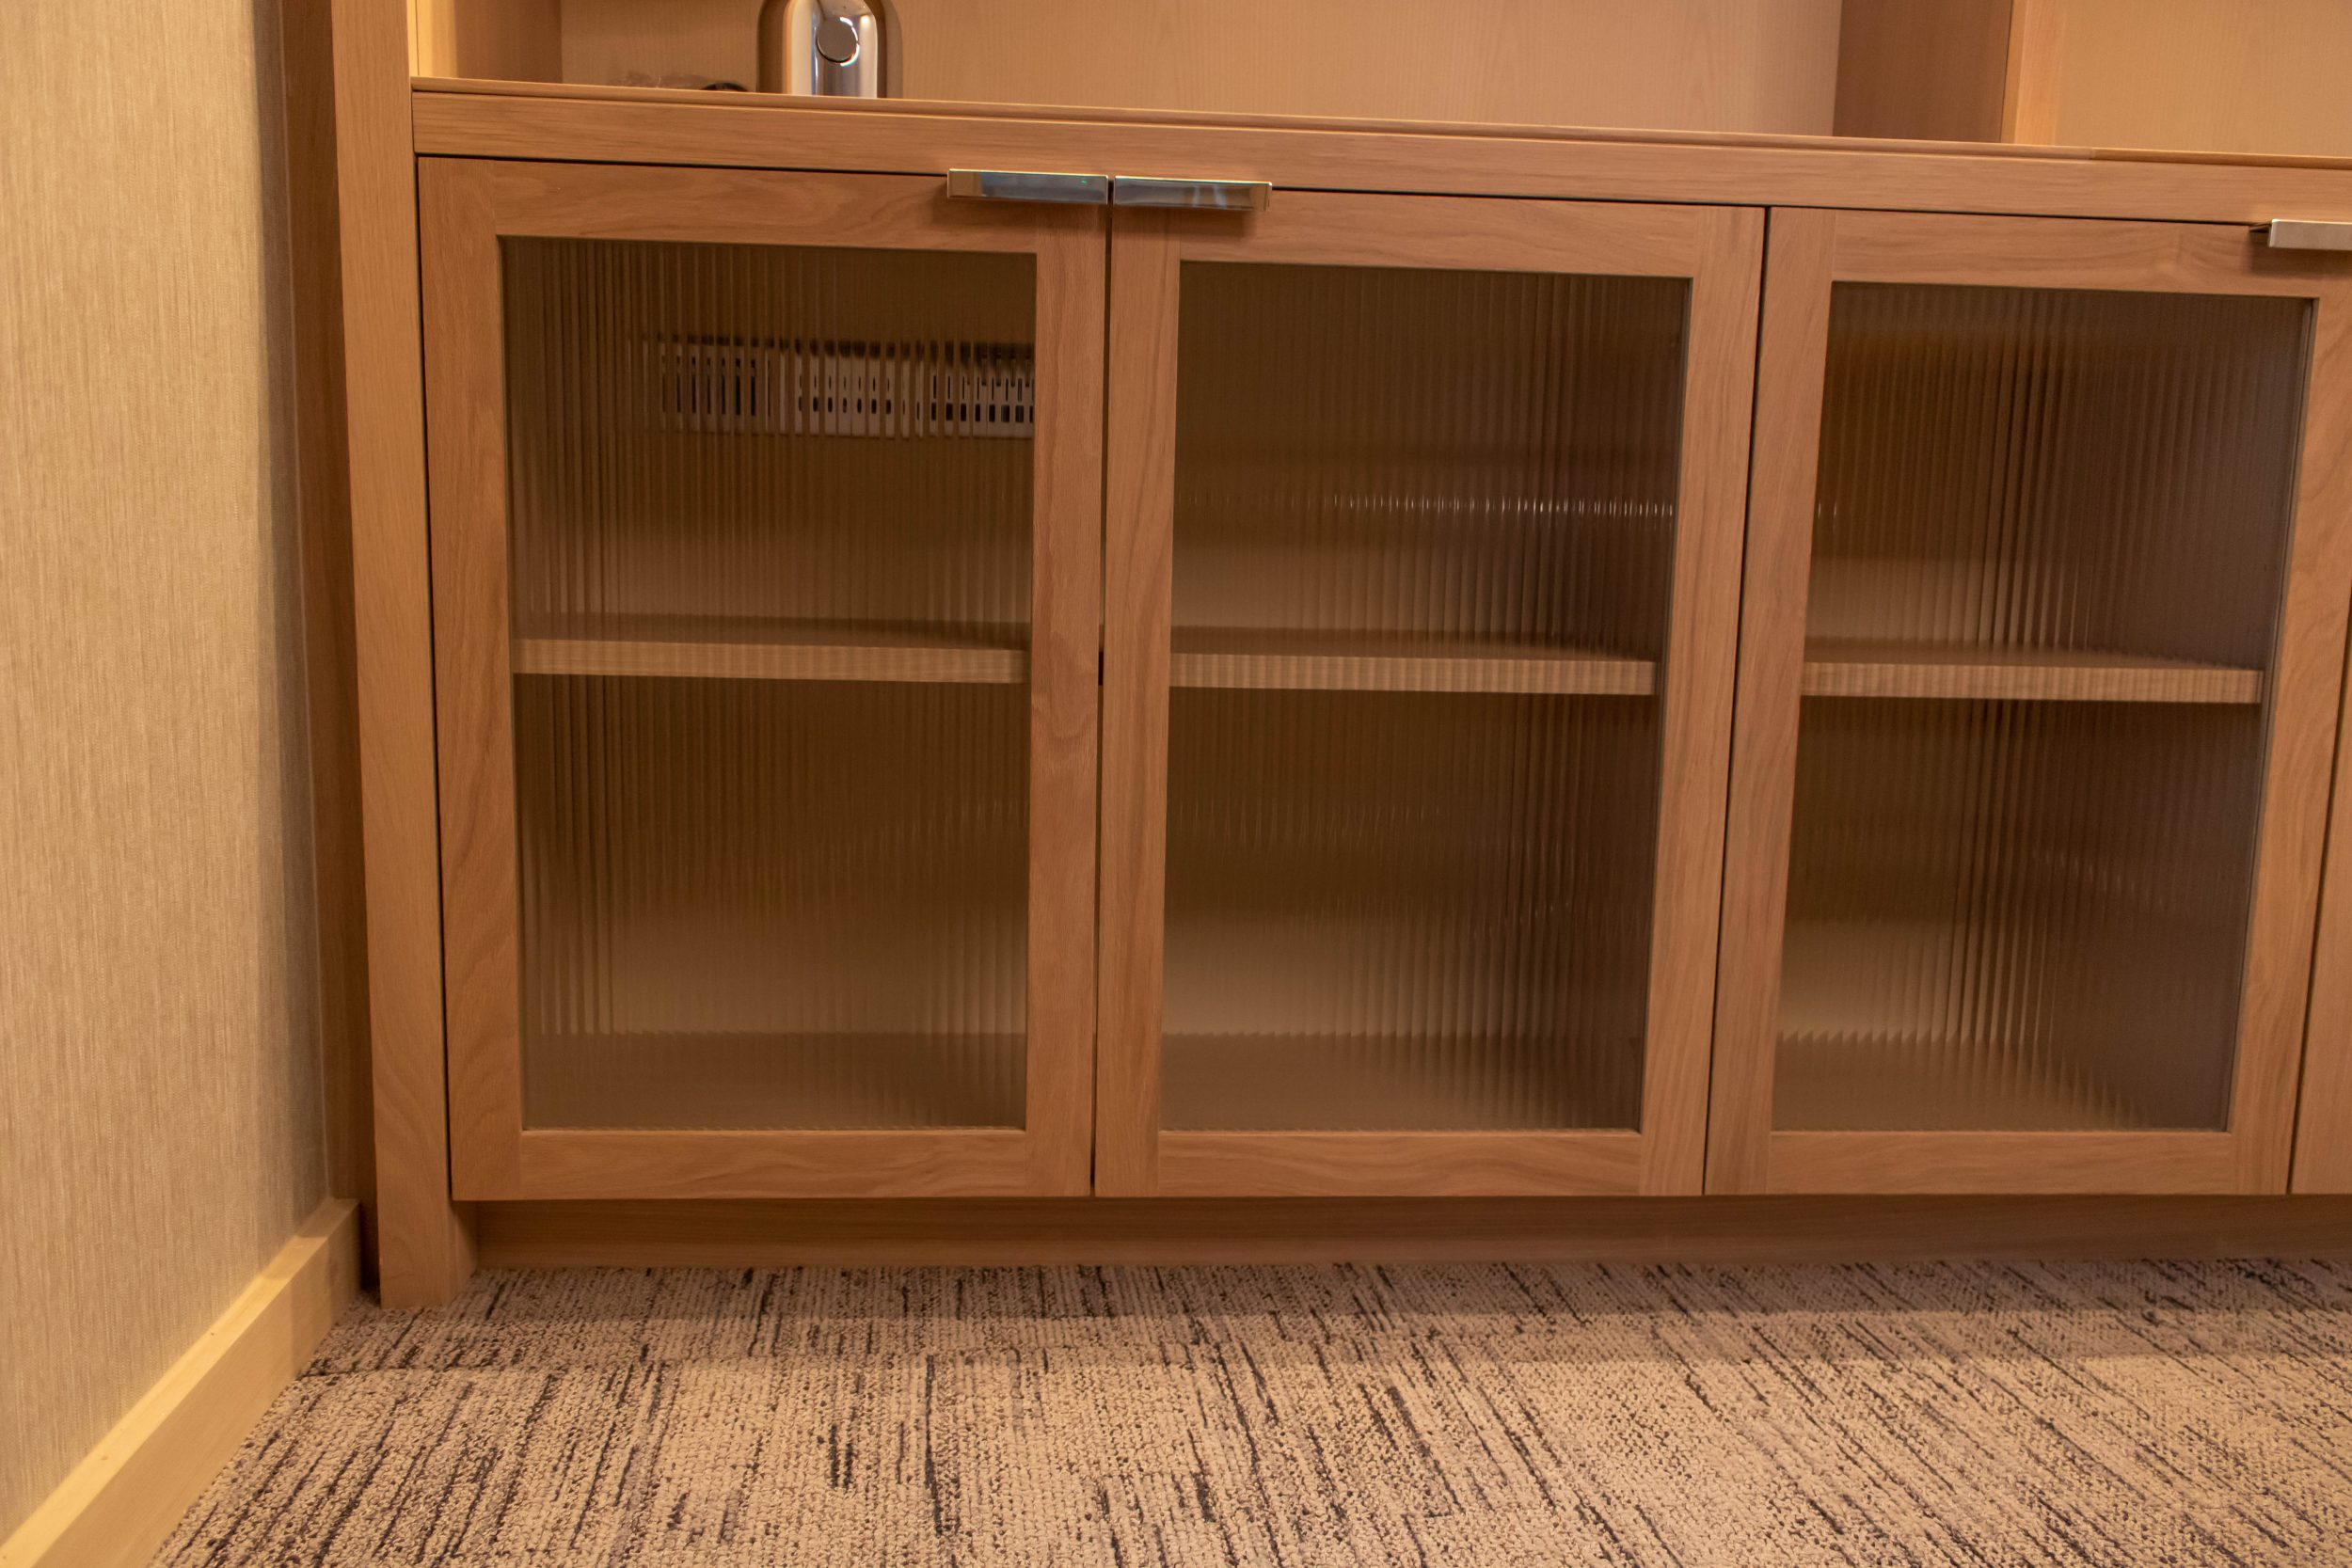 Kandd cabinetry design